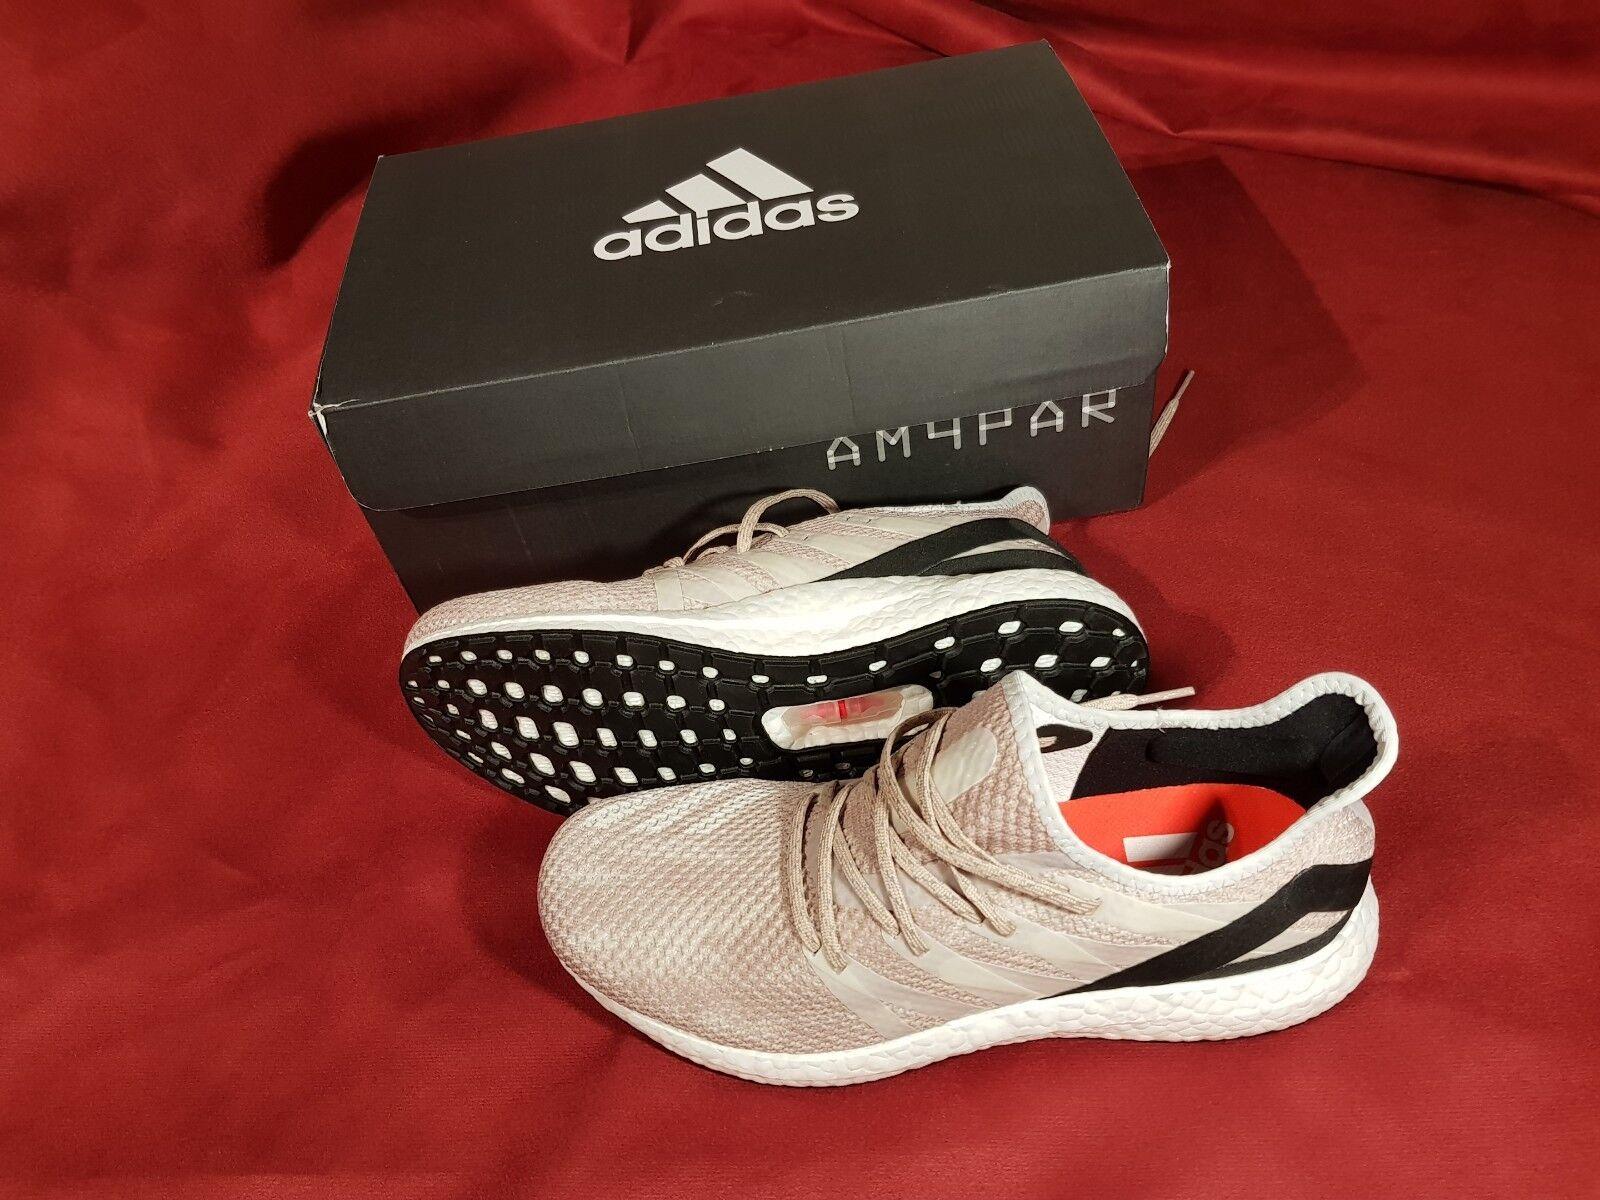 Adidas Speedfactory am4par Paris Limited UE 42 2 3 us 10